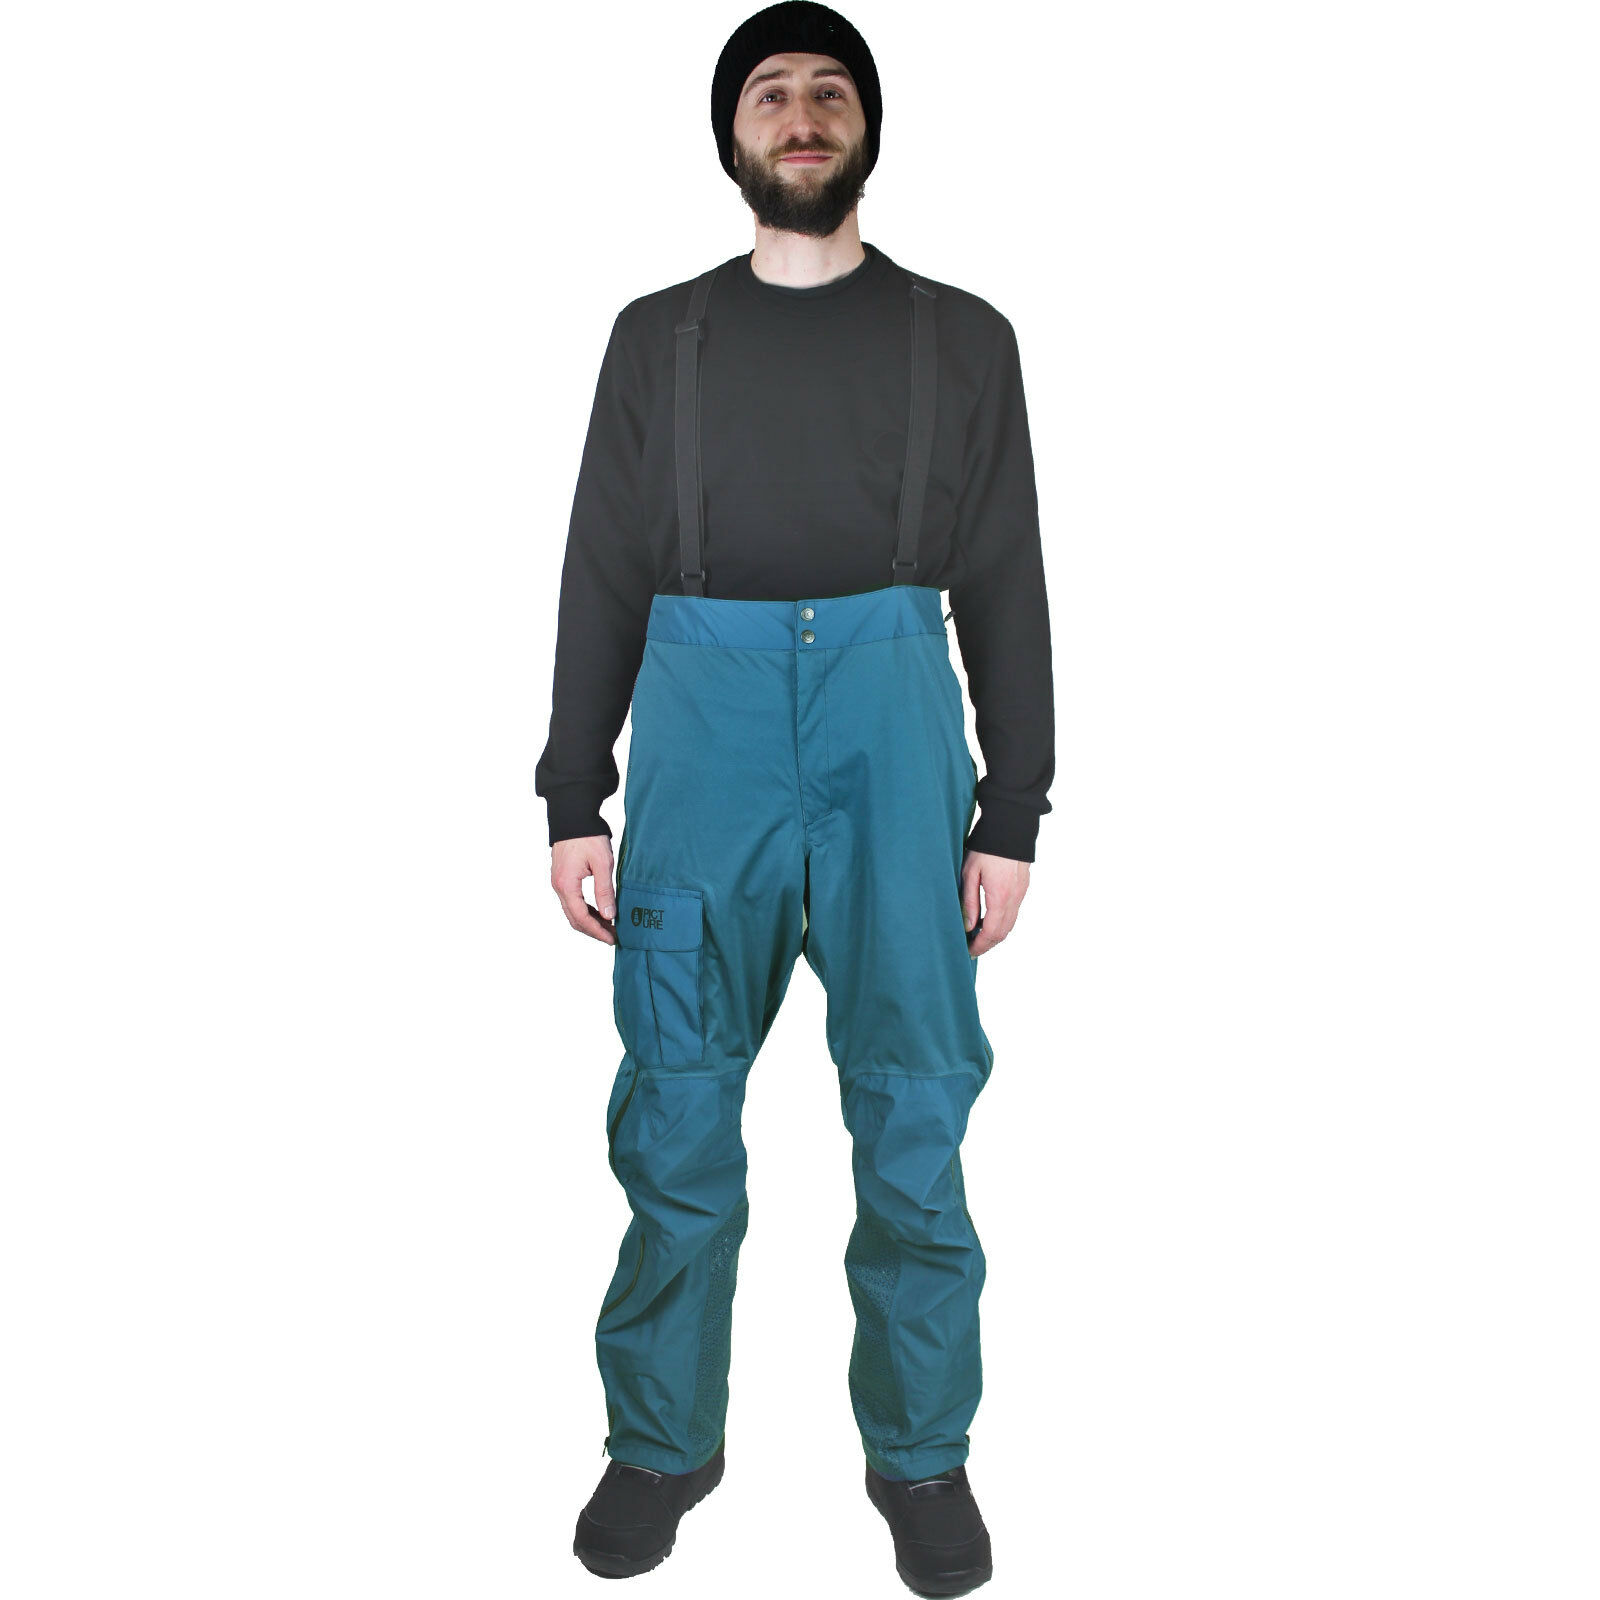 Picture Visk Pantaloni Sci Uomo da Snowboard Funzionali Neve